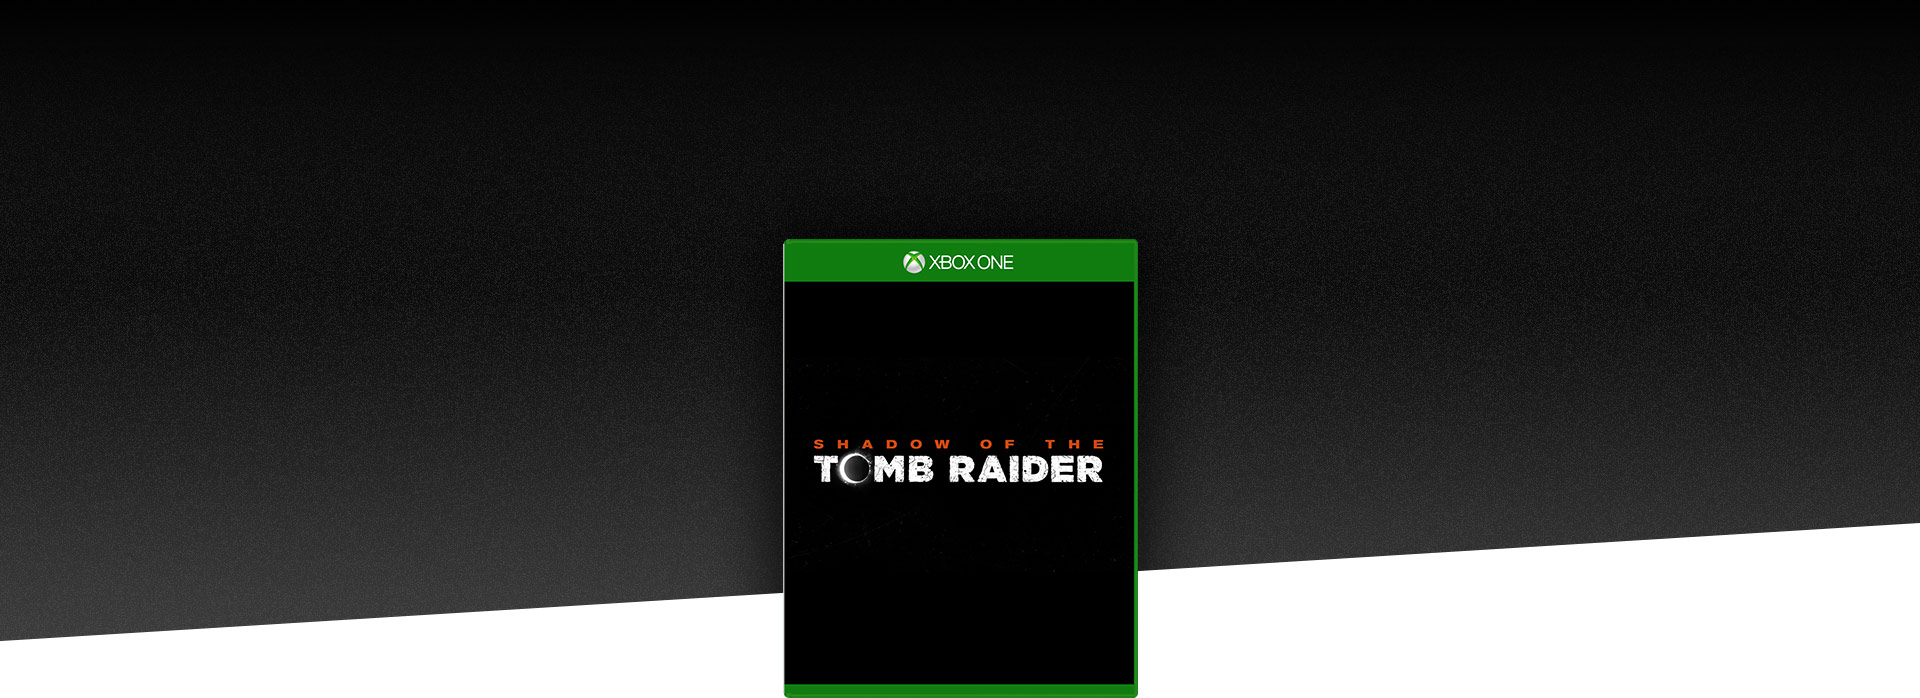 Shadow of the Tomb Raider boxshot